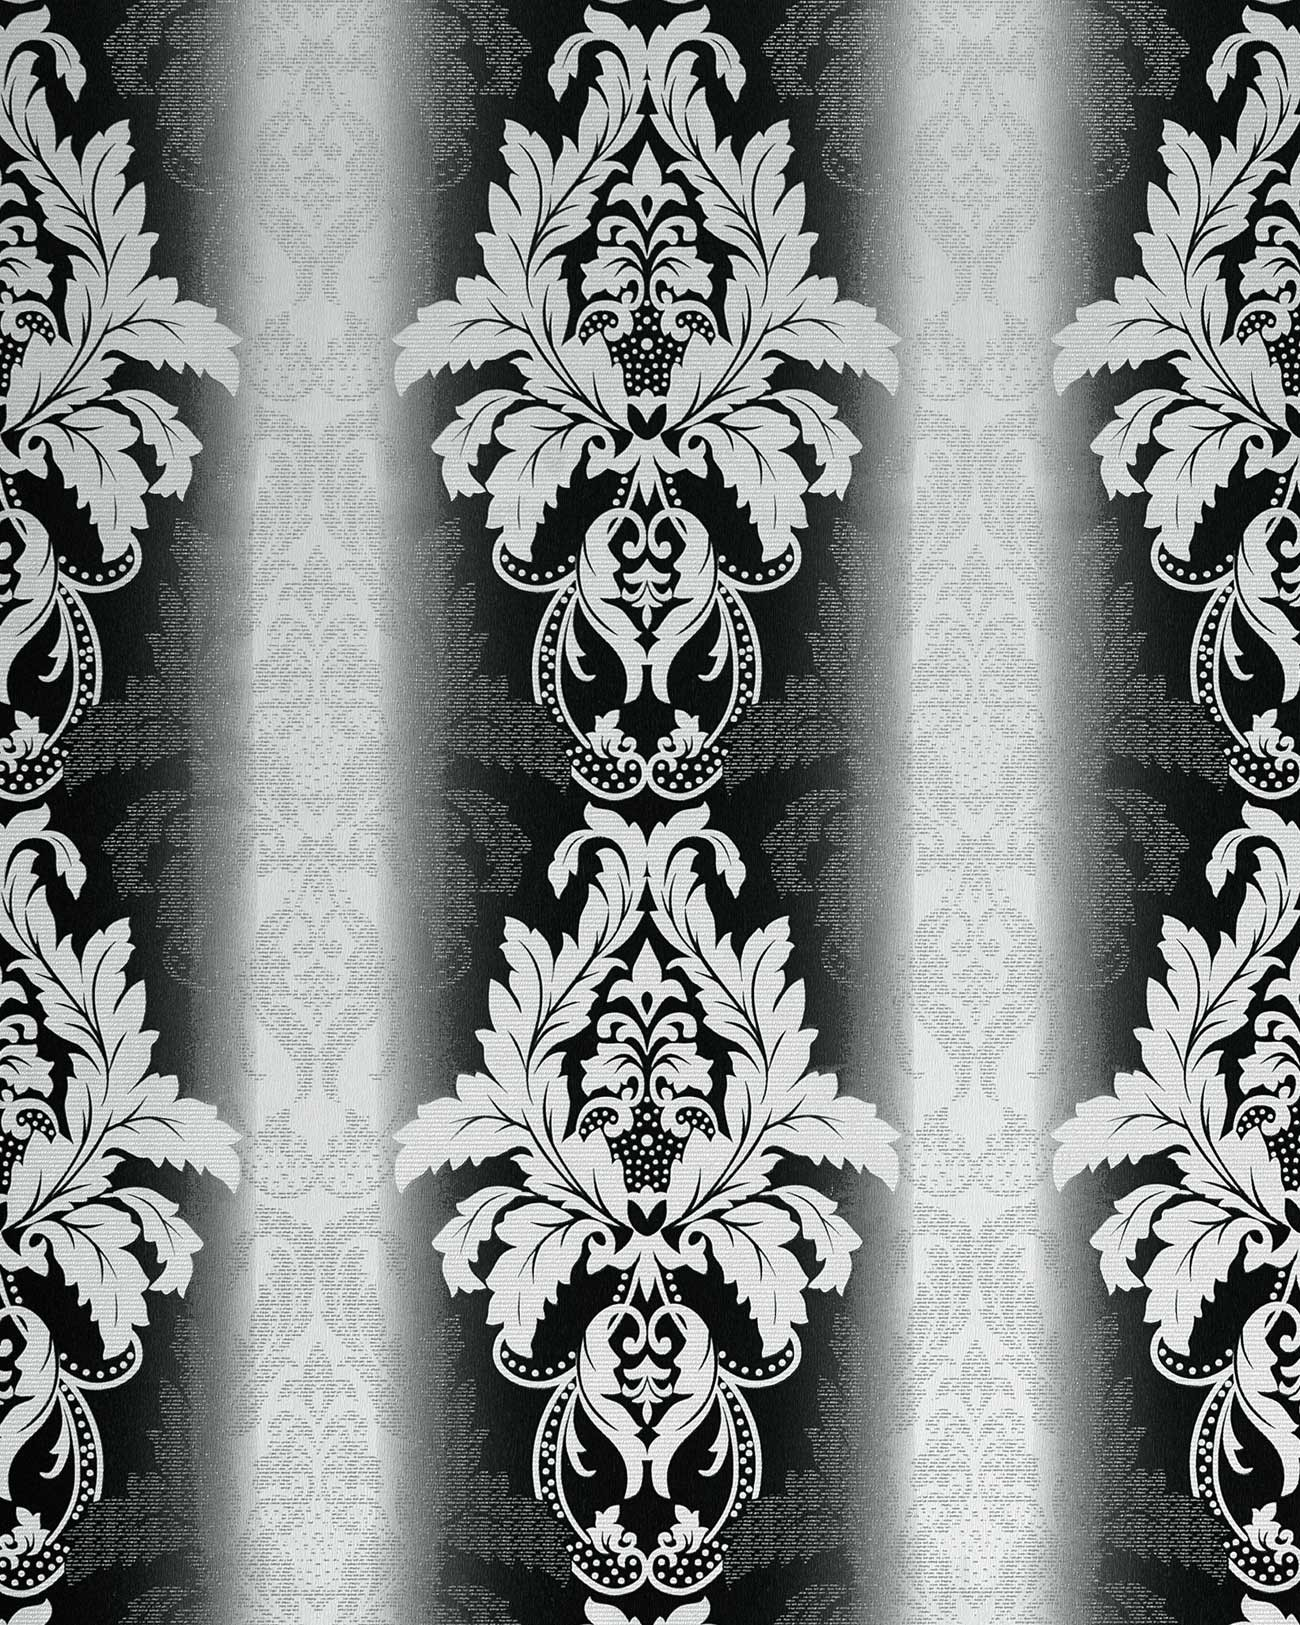 3d barock tapete damask edem 770 30 luxus tapete for 3d tapete silber